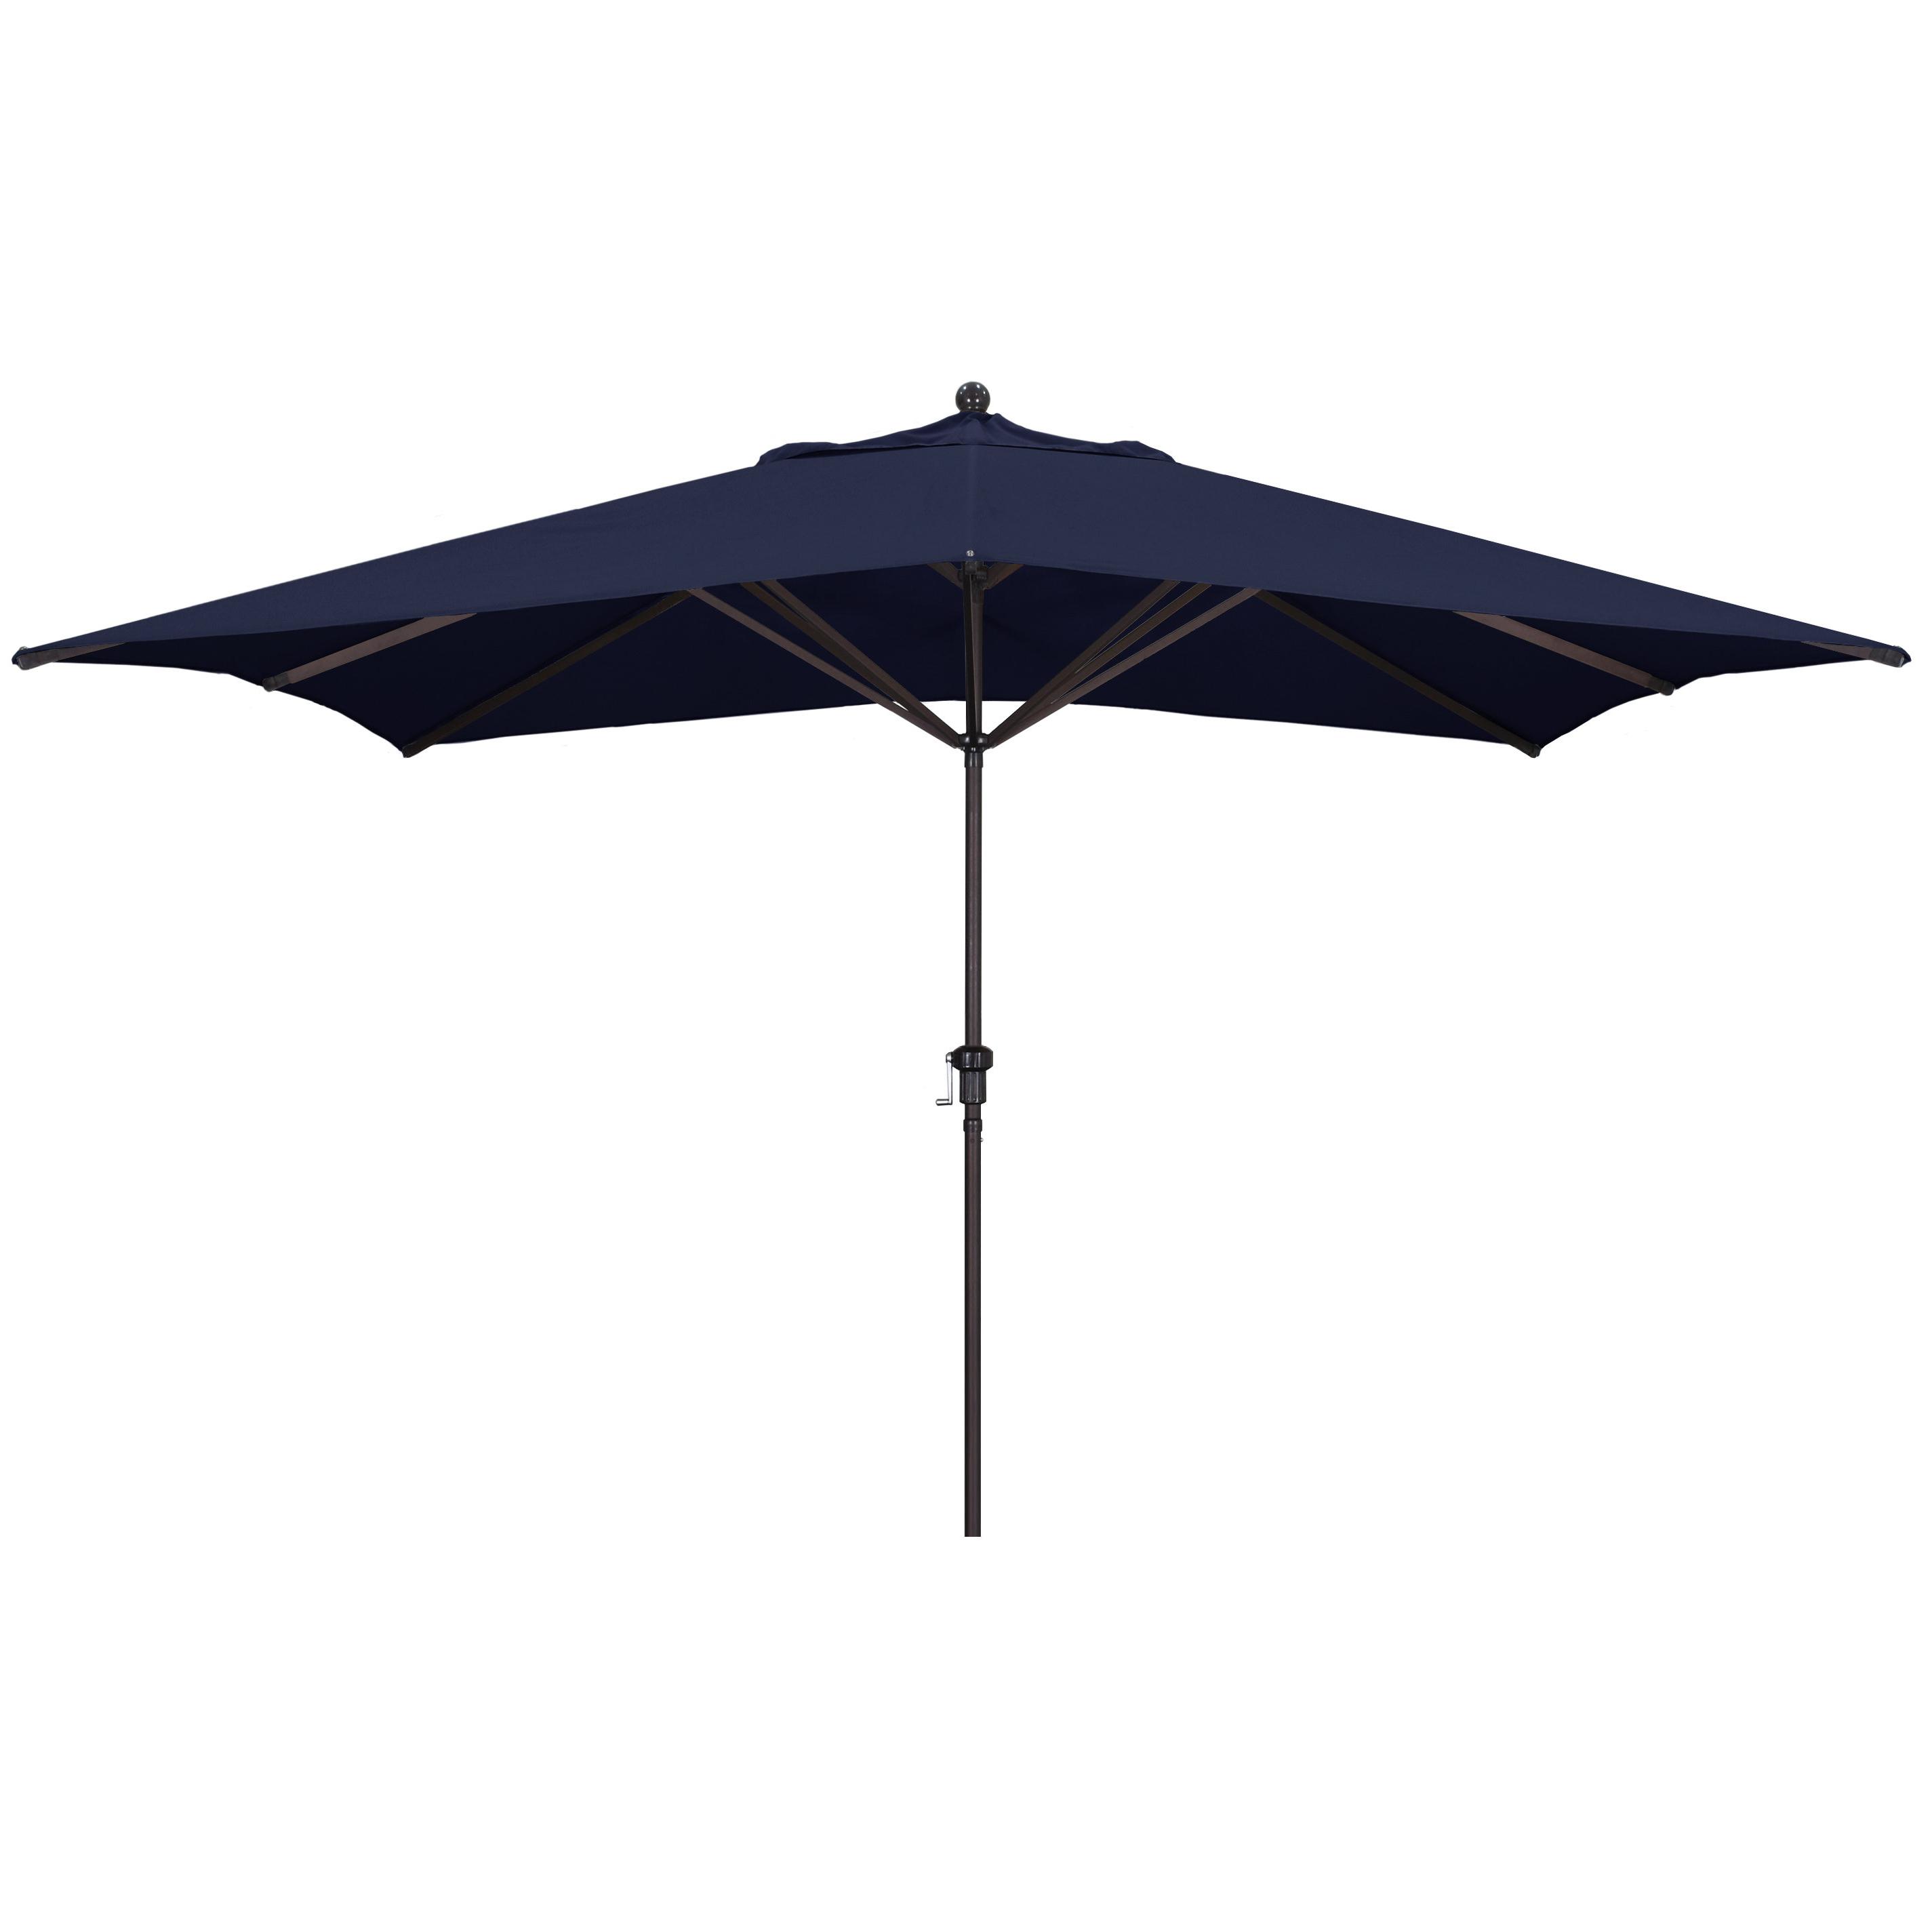 Well Liked Carlton 11' X 8' Rectangular Market Umbrella Within Norah Rectangular Market Umbrellas (View 11 of 20)